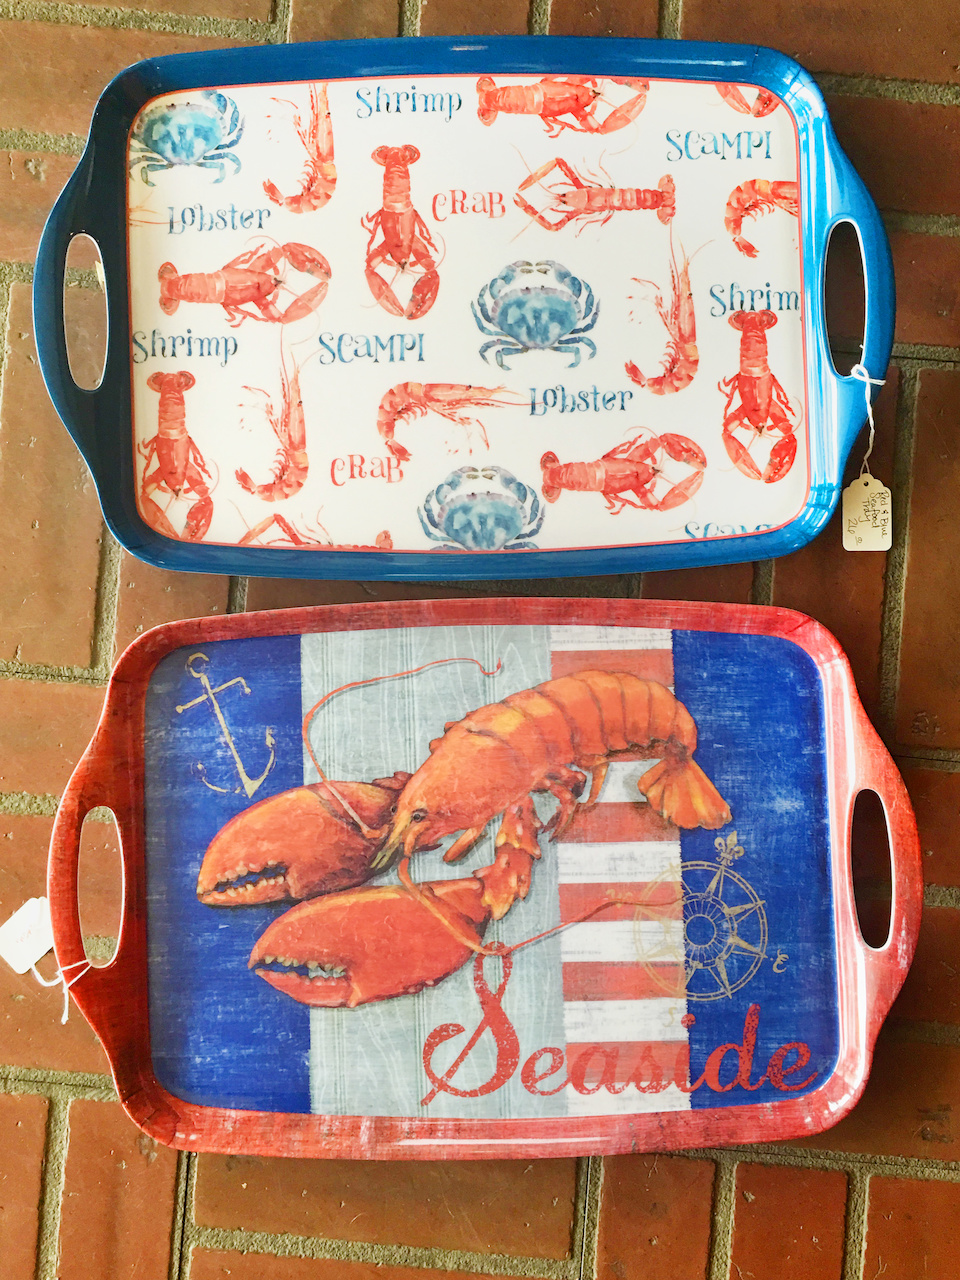 Party trays, $26 each, at The Dandé Lion